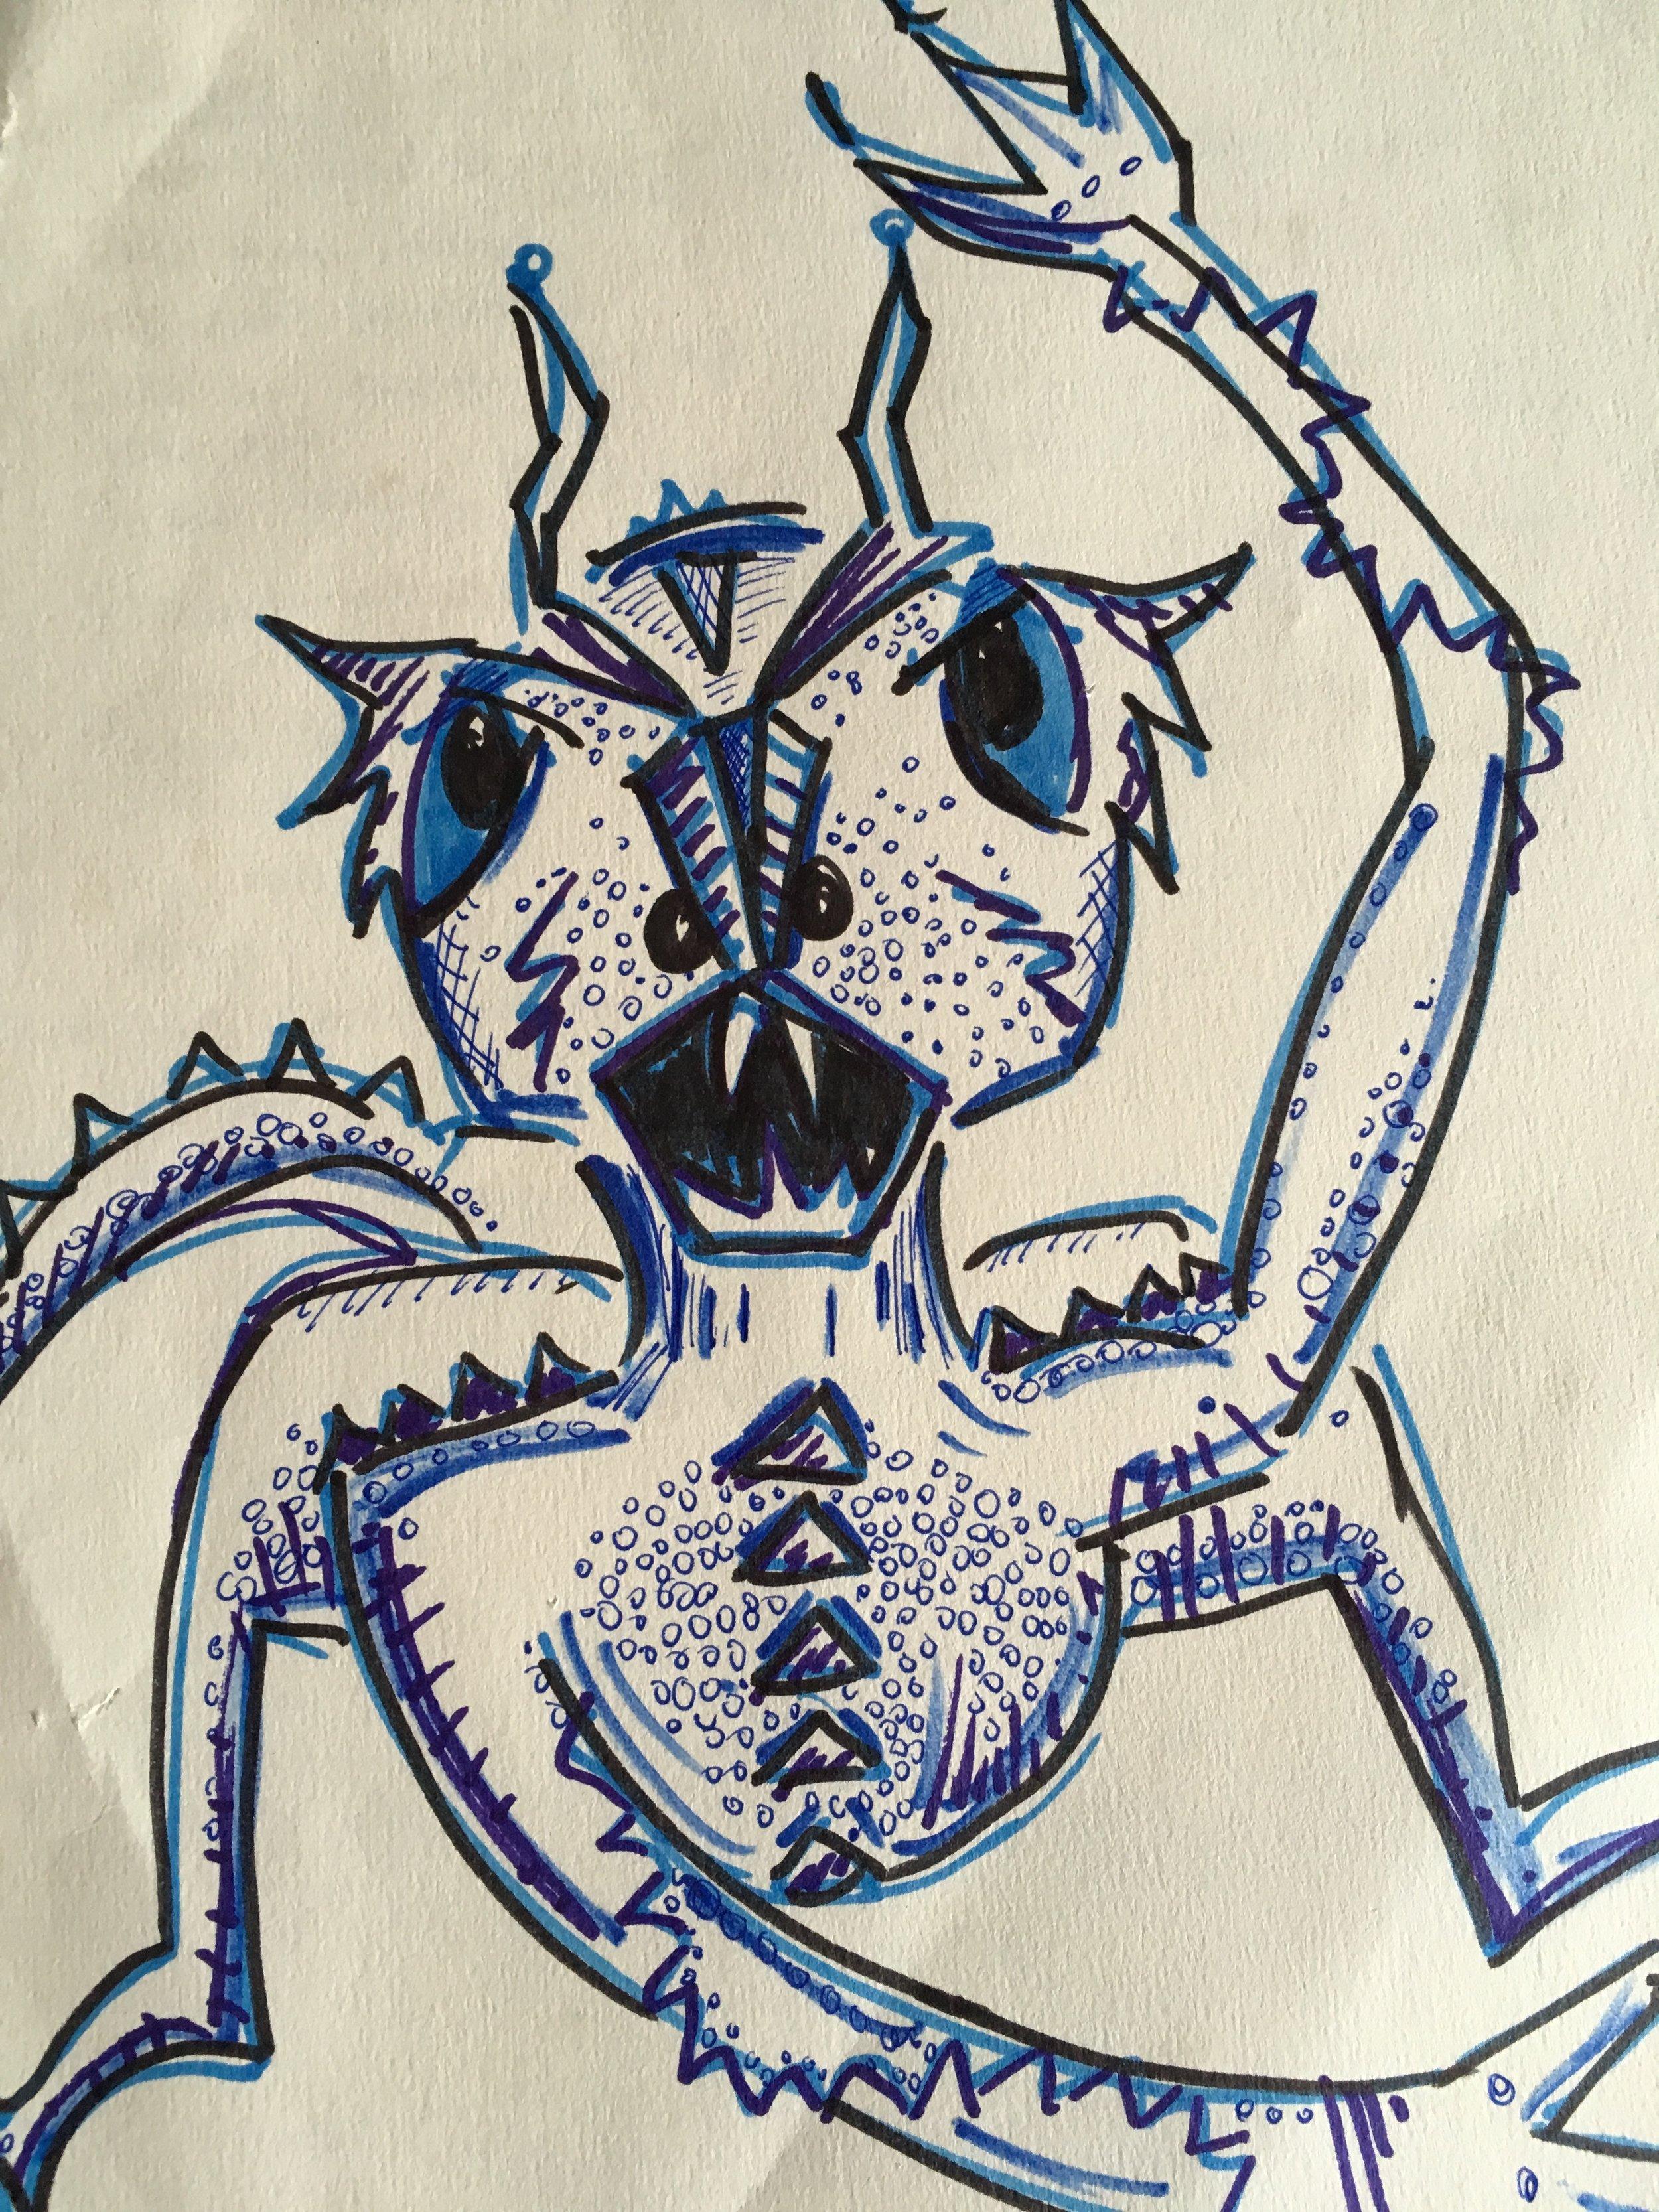 Image of a gyik, with sharp teeth, lizard-like body, running on hind legs.